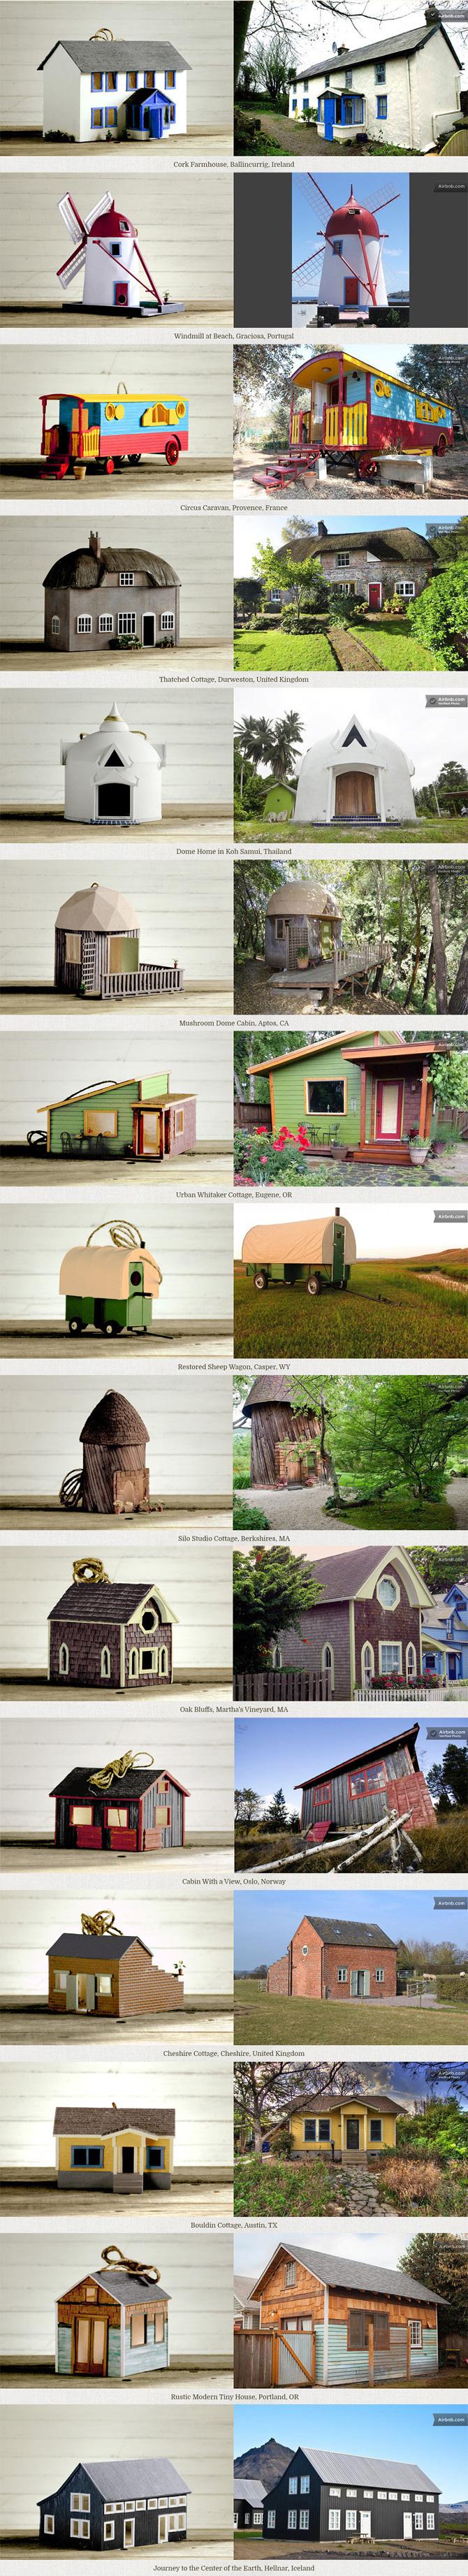 Houses_Strip_2_670.jpg